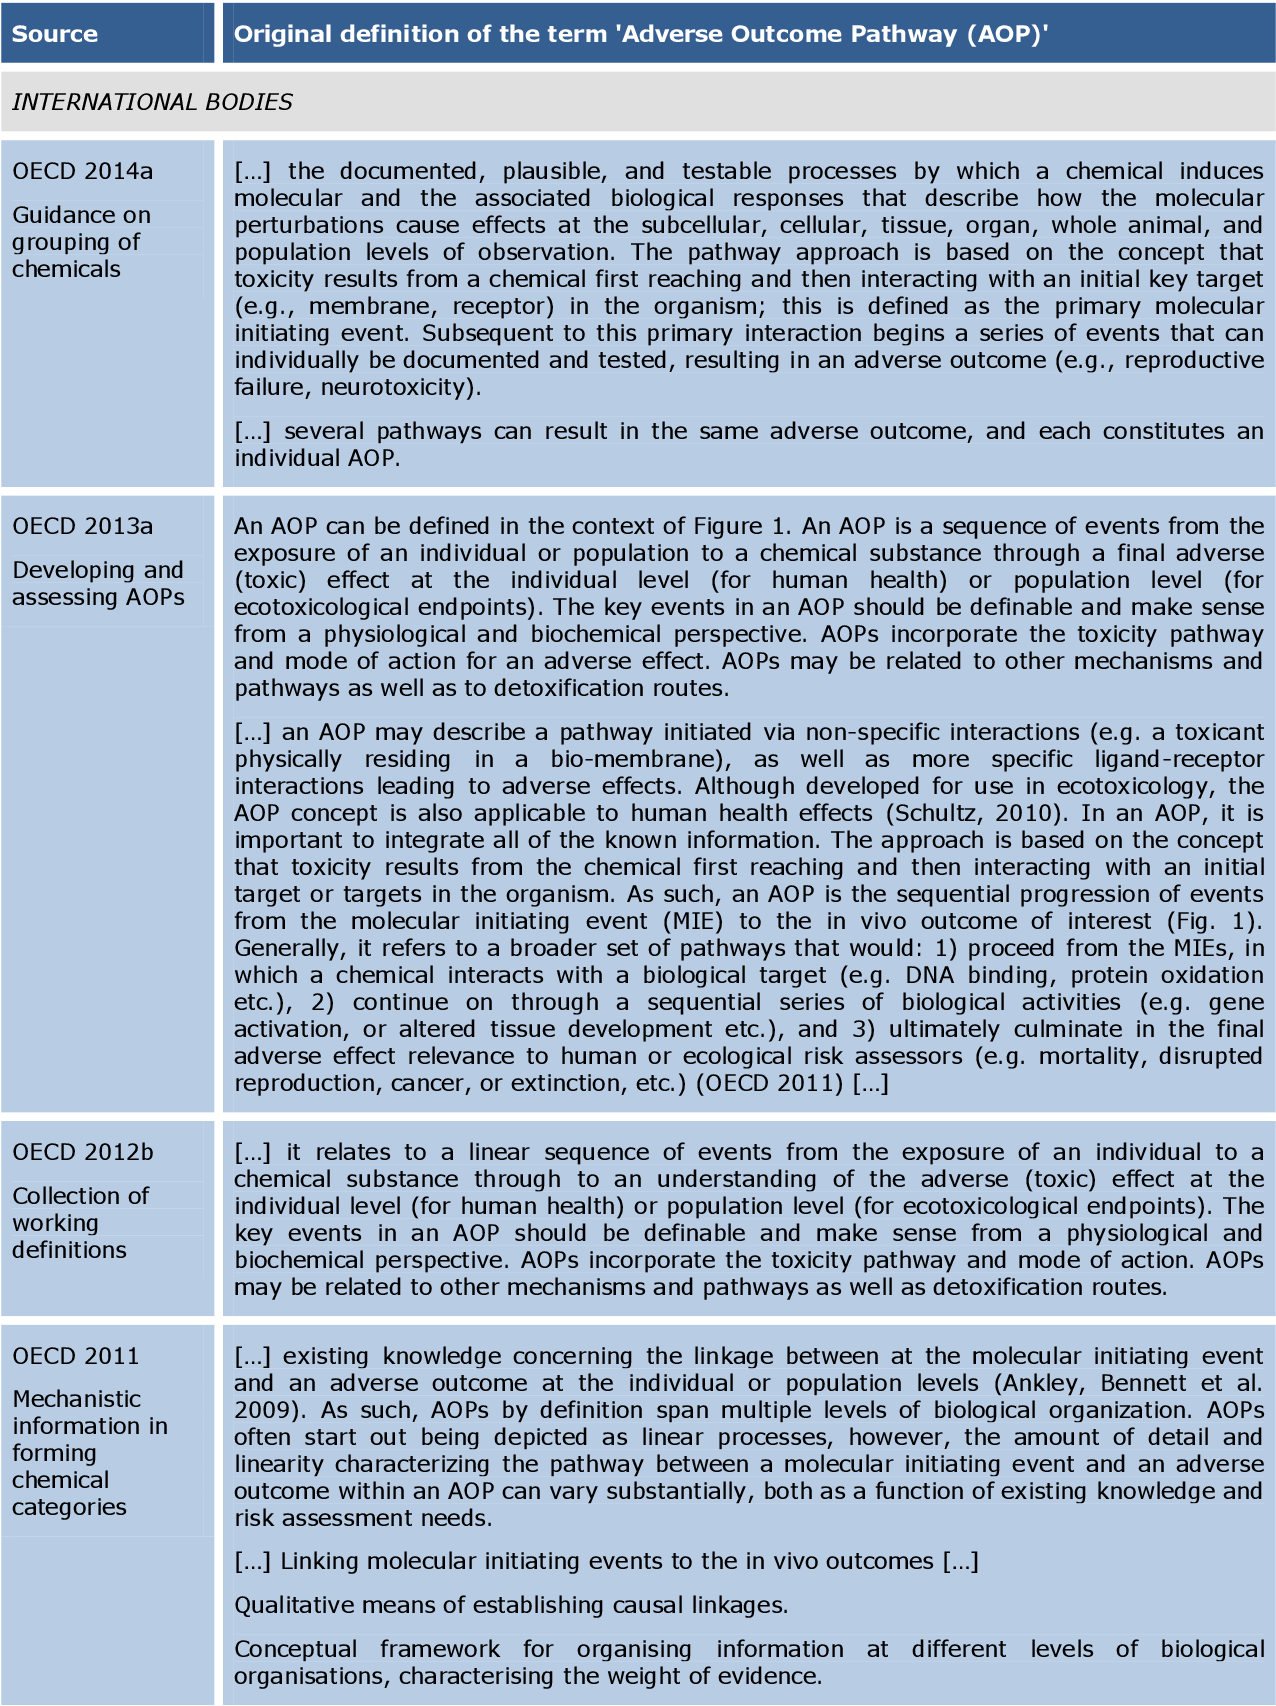 PDF] NANoREG harmonised terminology for environmental health